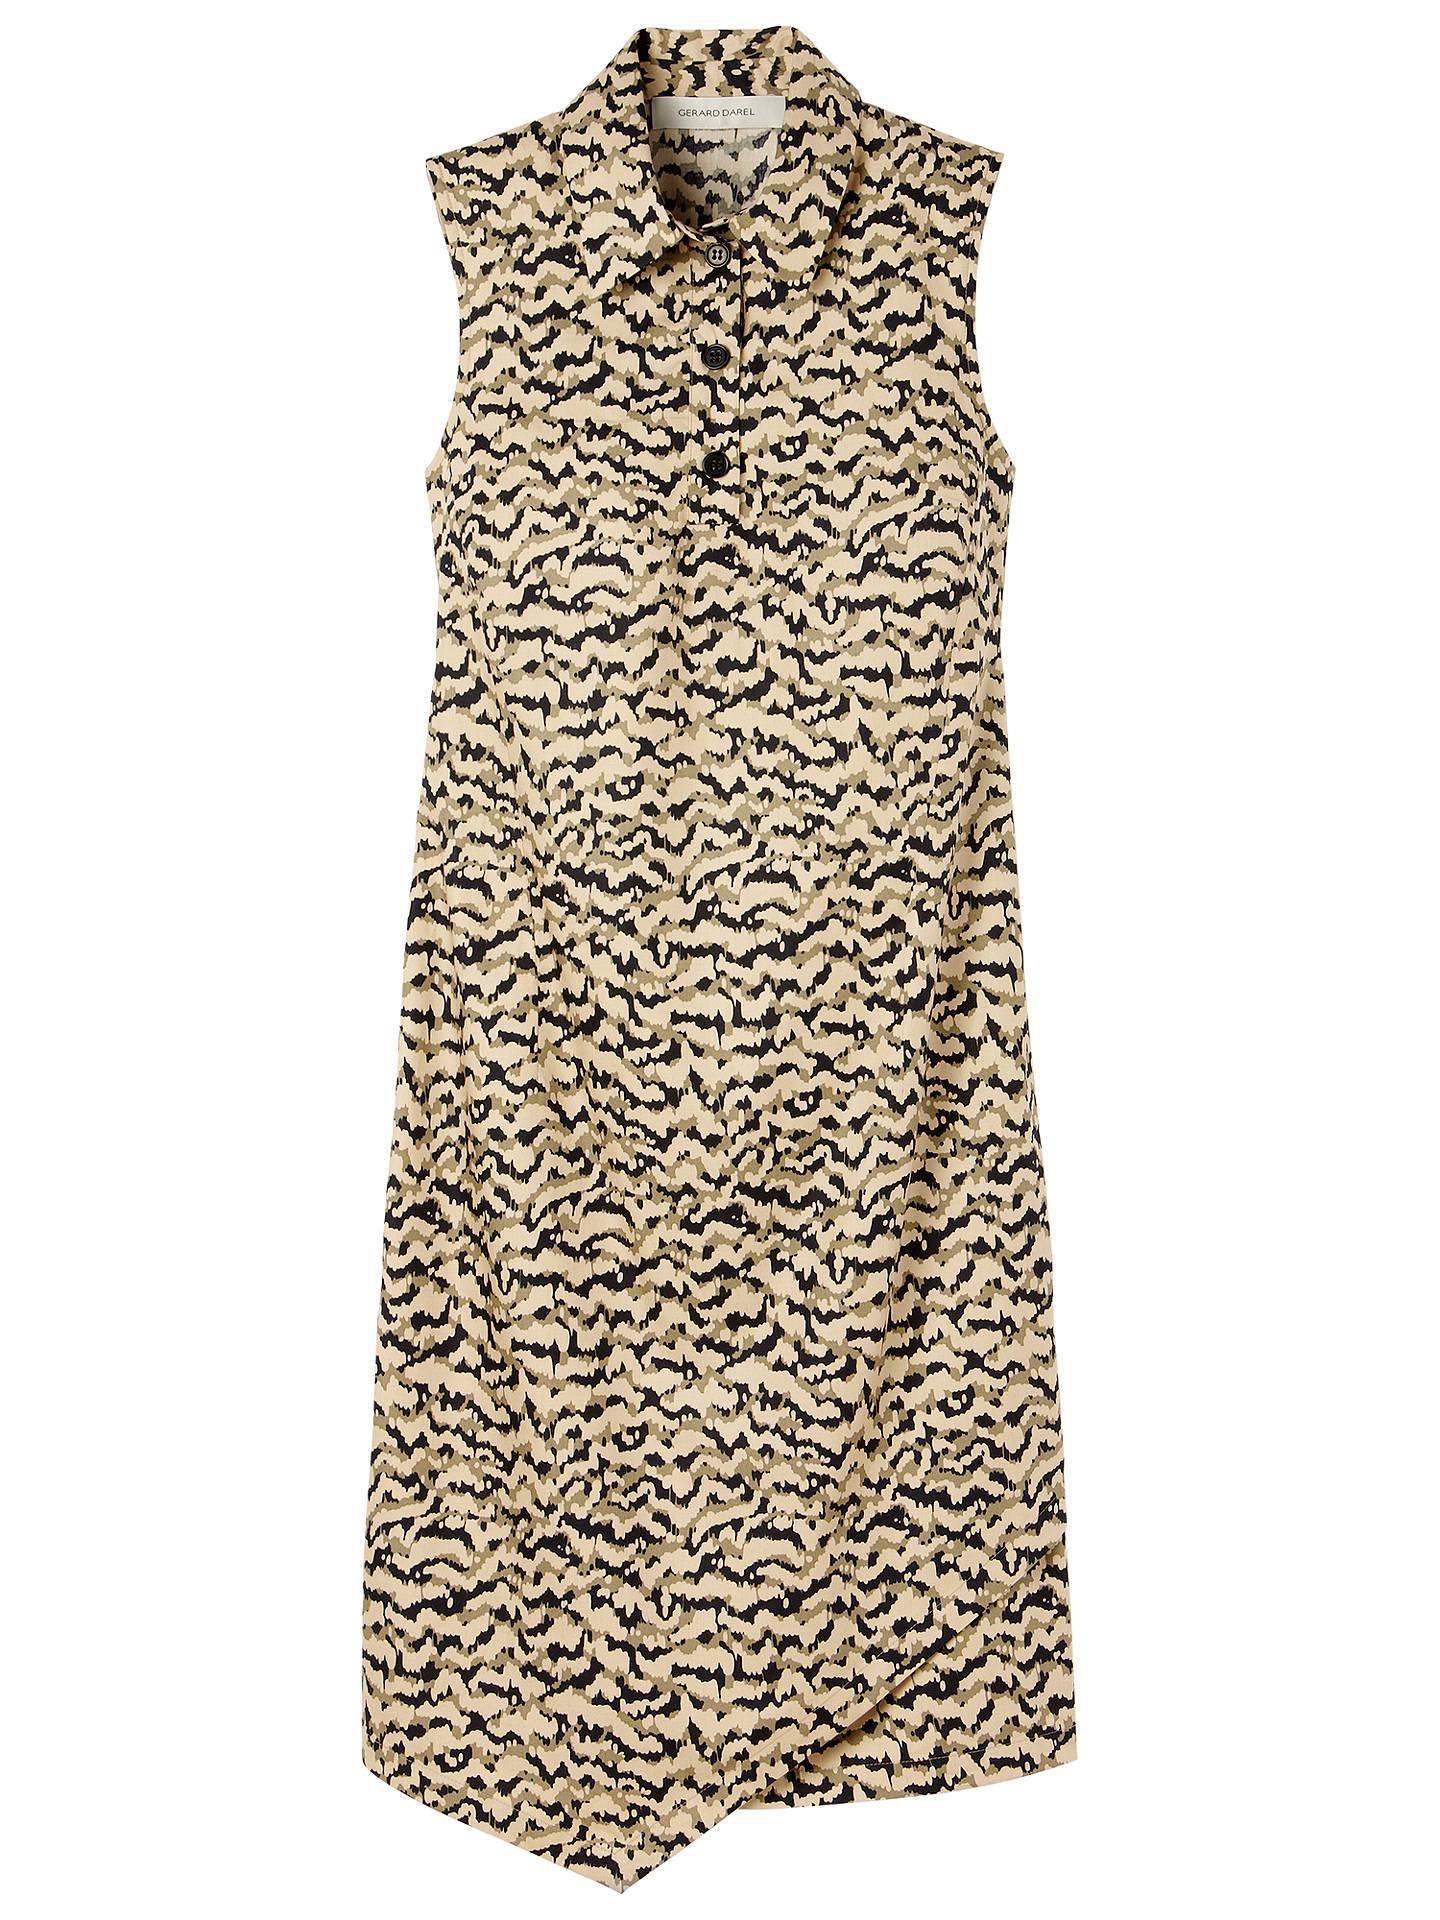 378ce35798020 Buy Gérard Darel Shirt Dress, Army Print, 14 Online at johnlewis.com ...